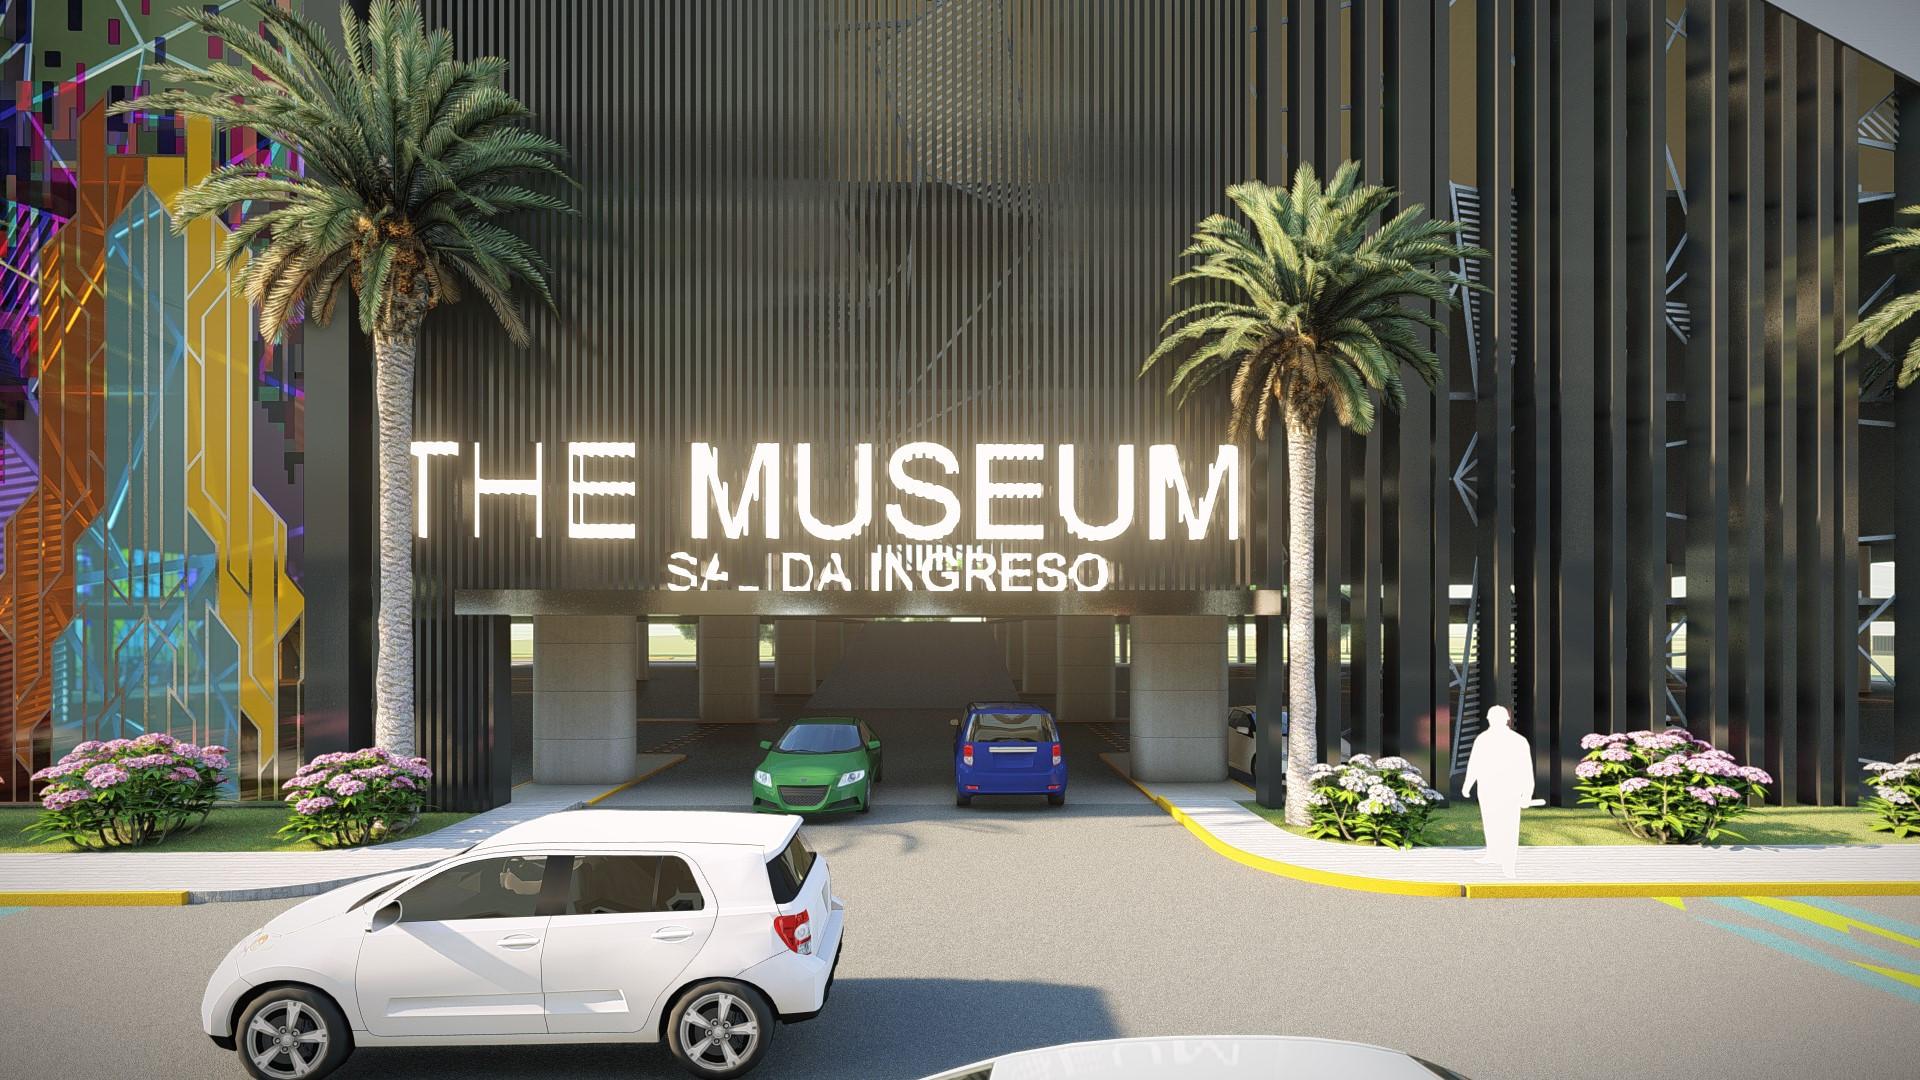 The Museum_Photo - 6.jpg